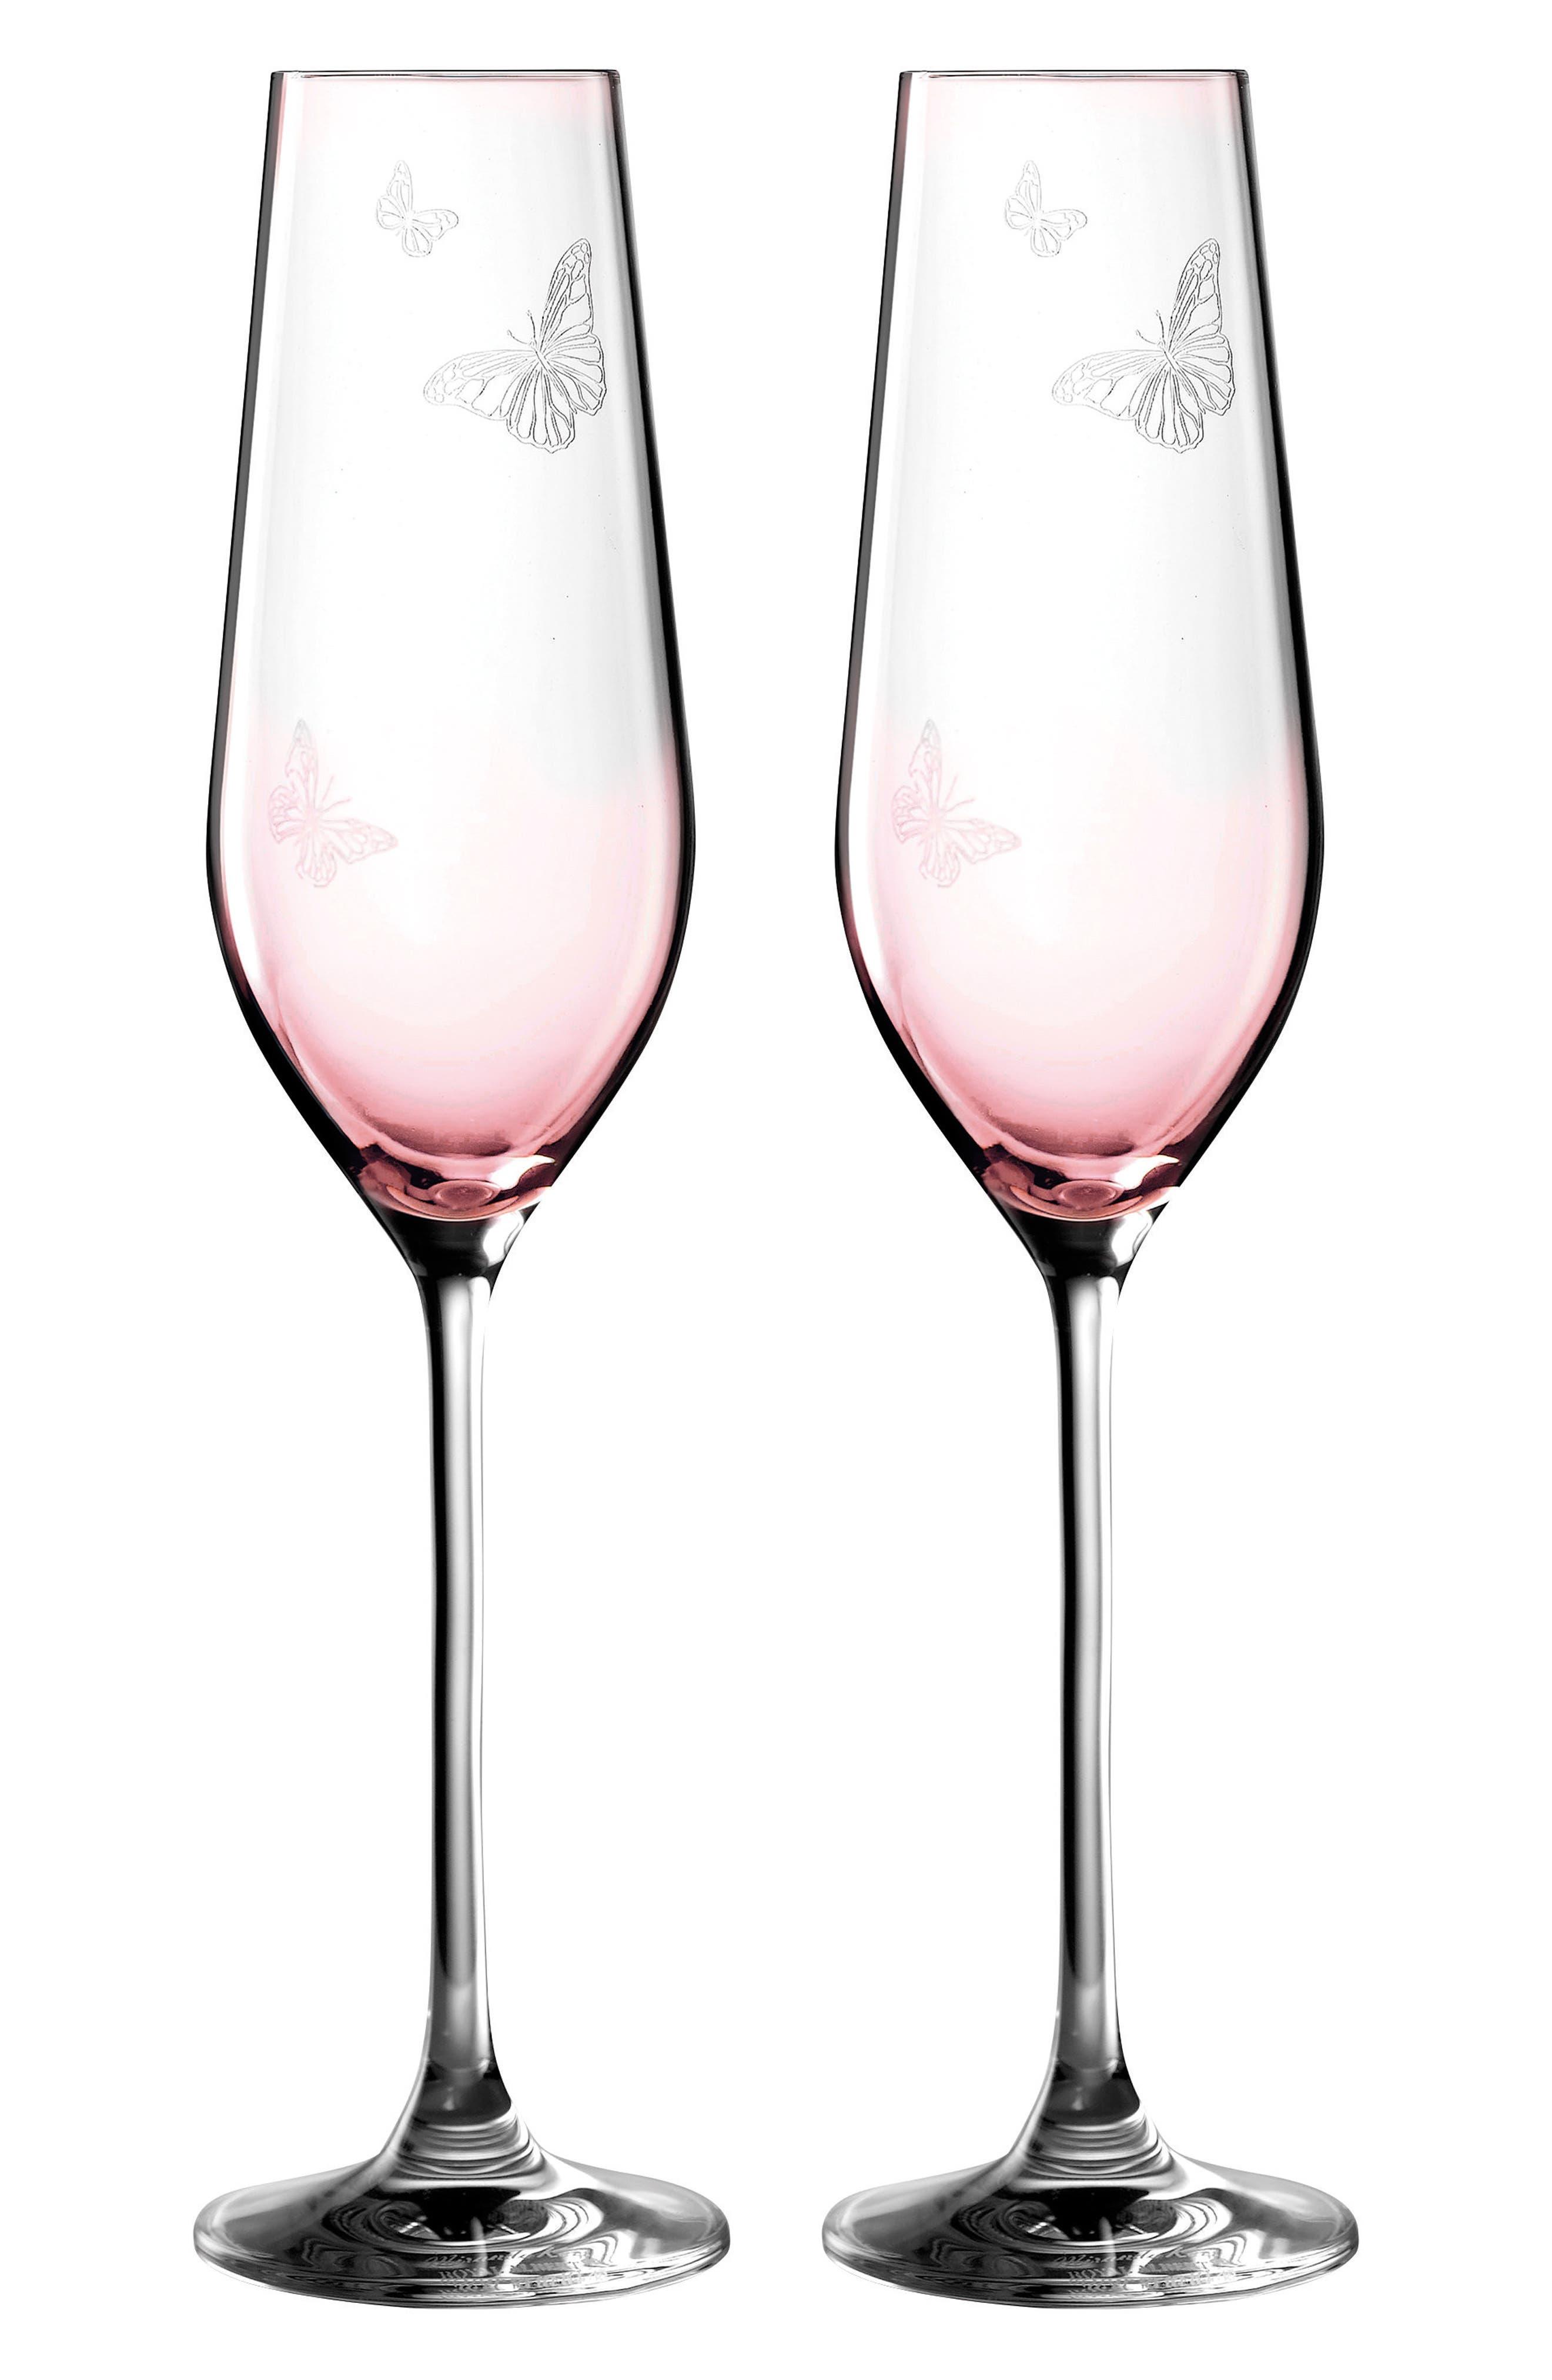 Main Image - Miranda Kerr for Royal Albert Friendship Set of 2 Champagne Flutes